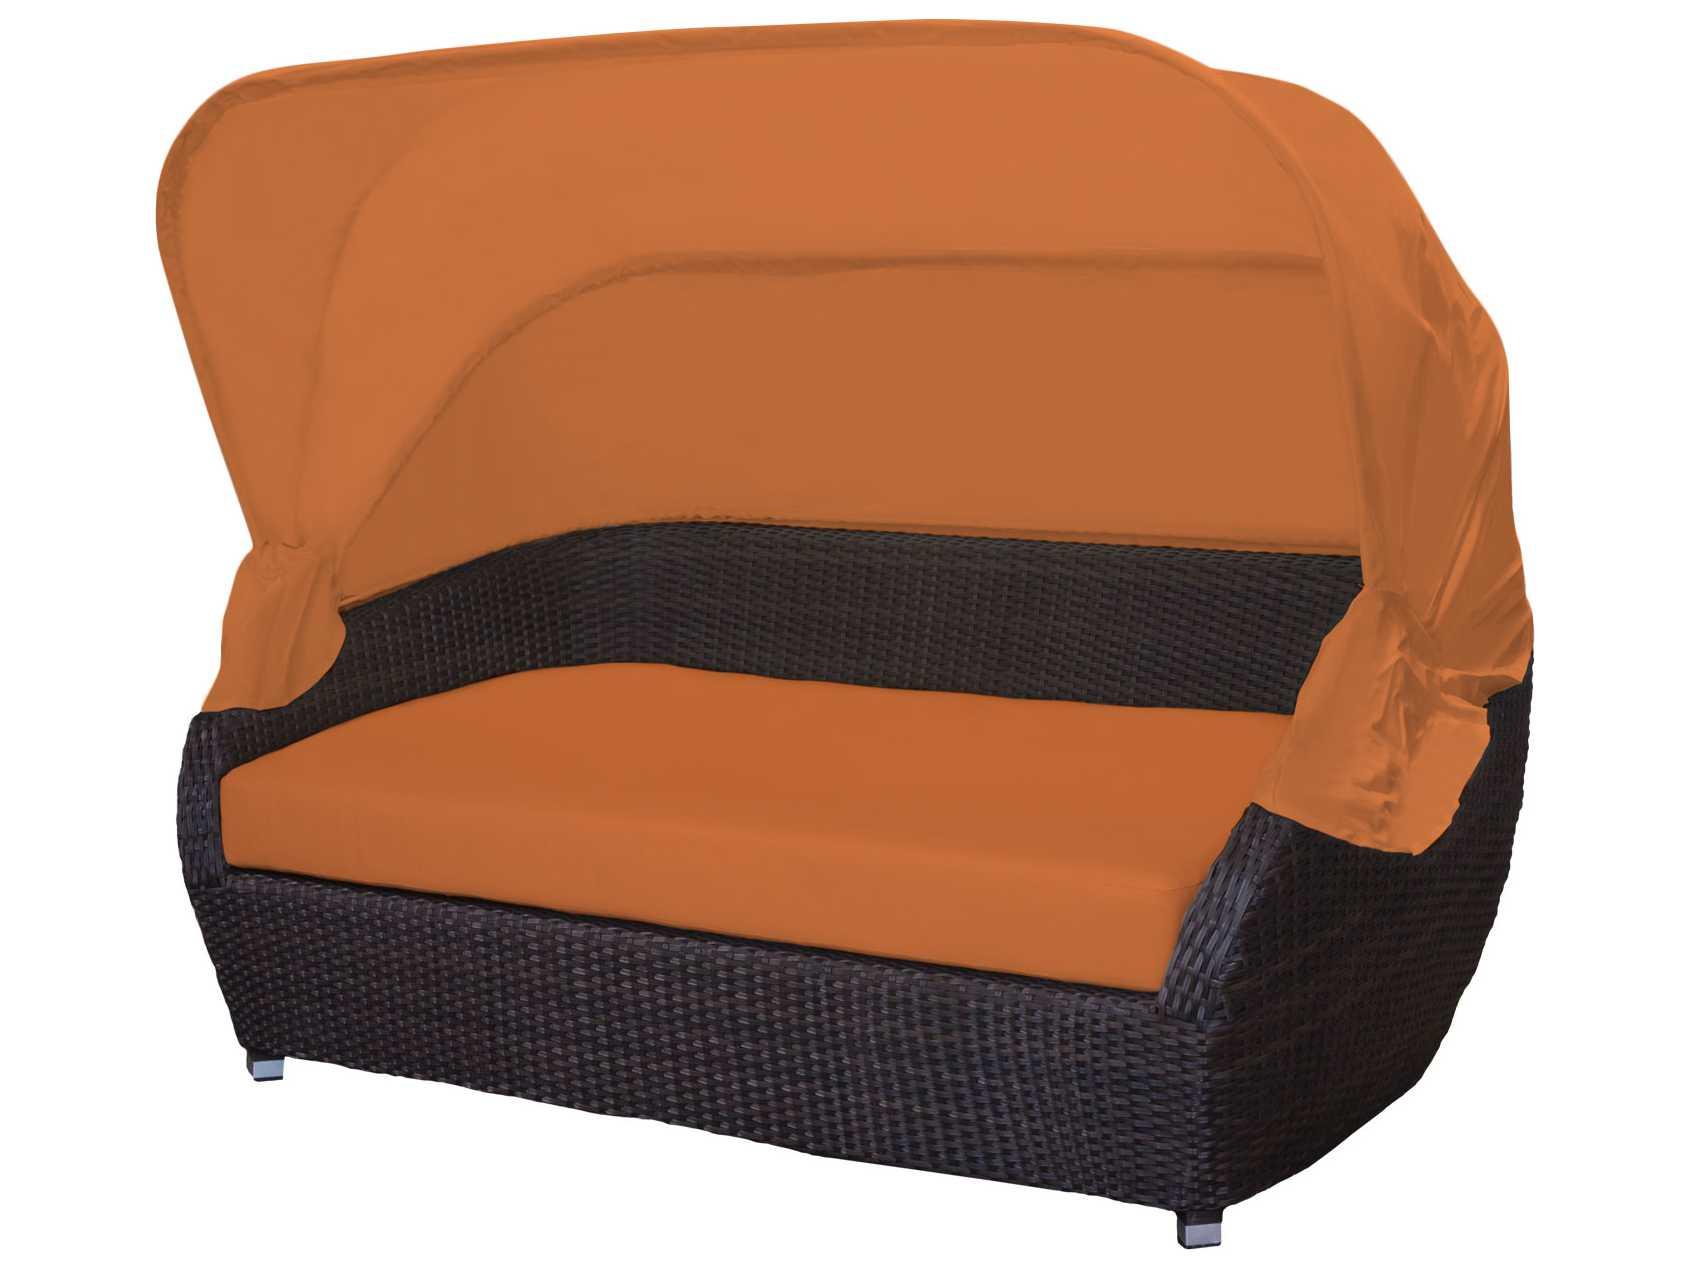 fresh outdoor graphics u home market of photos solano world garden patio source furniture indoor elegant